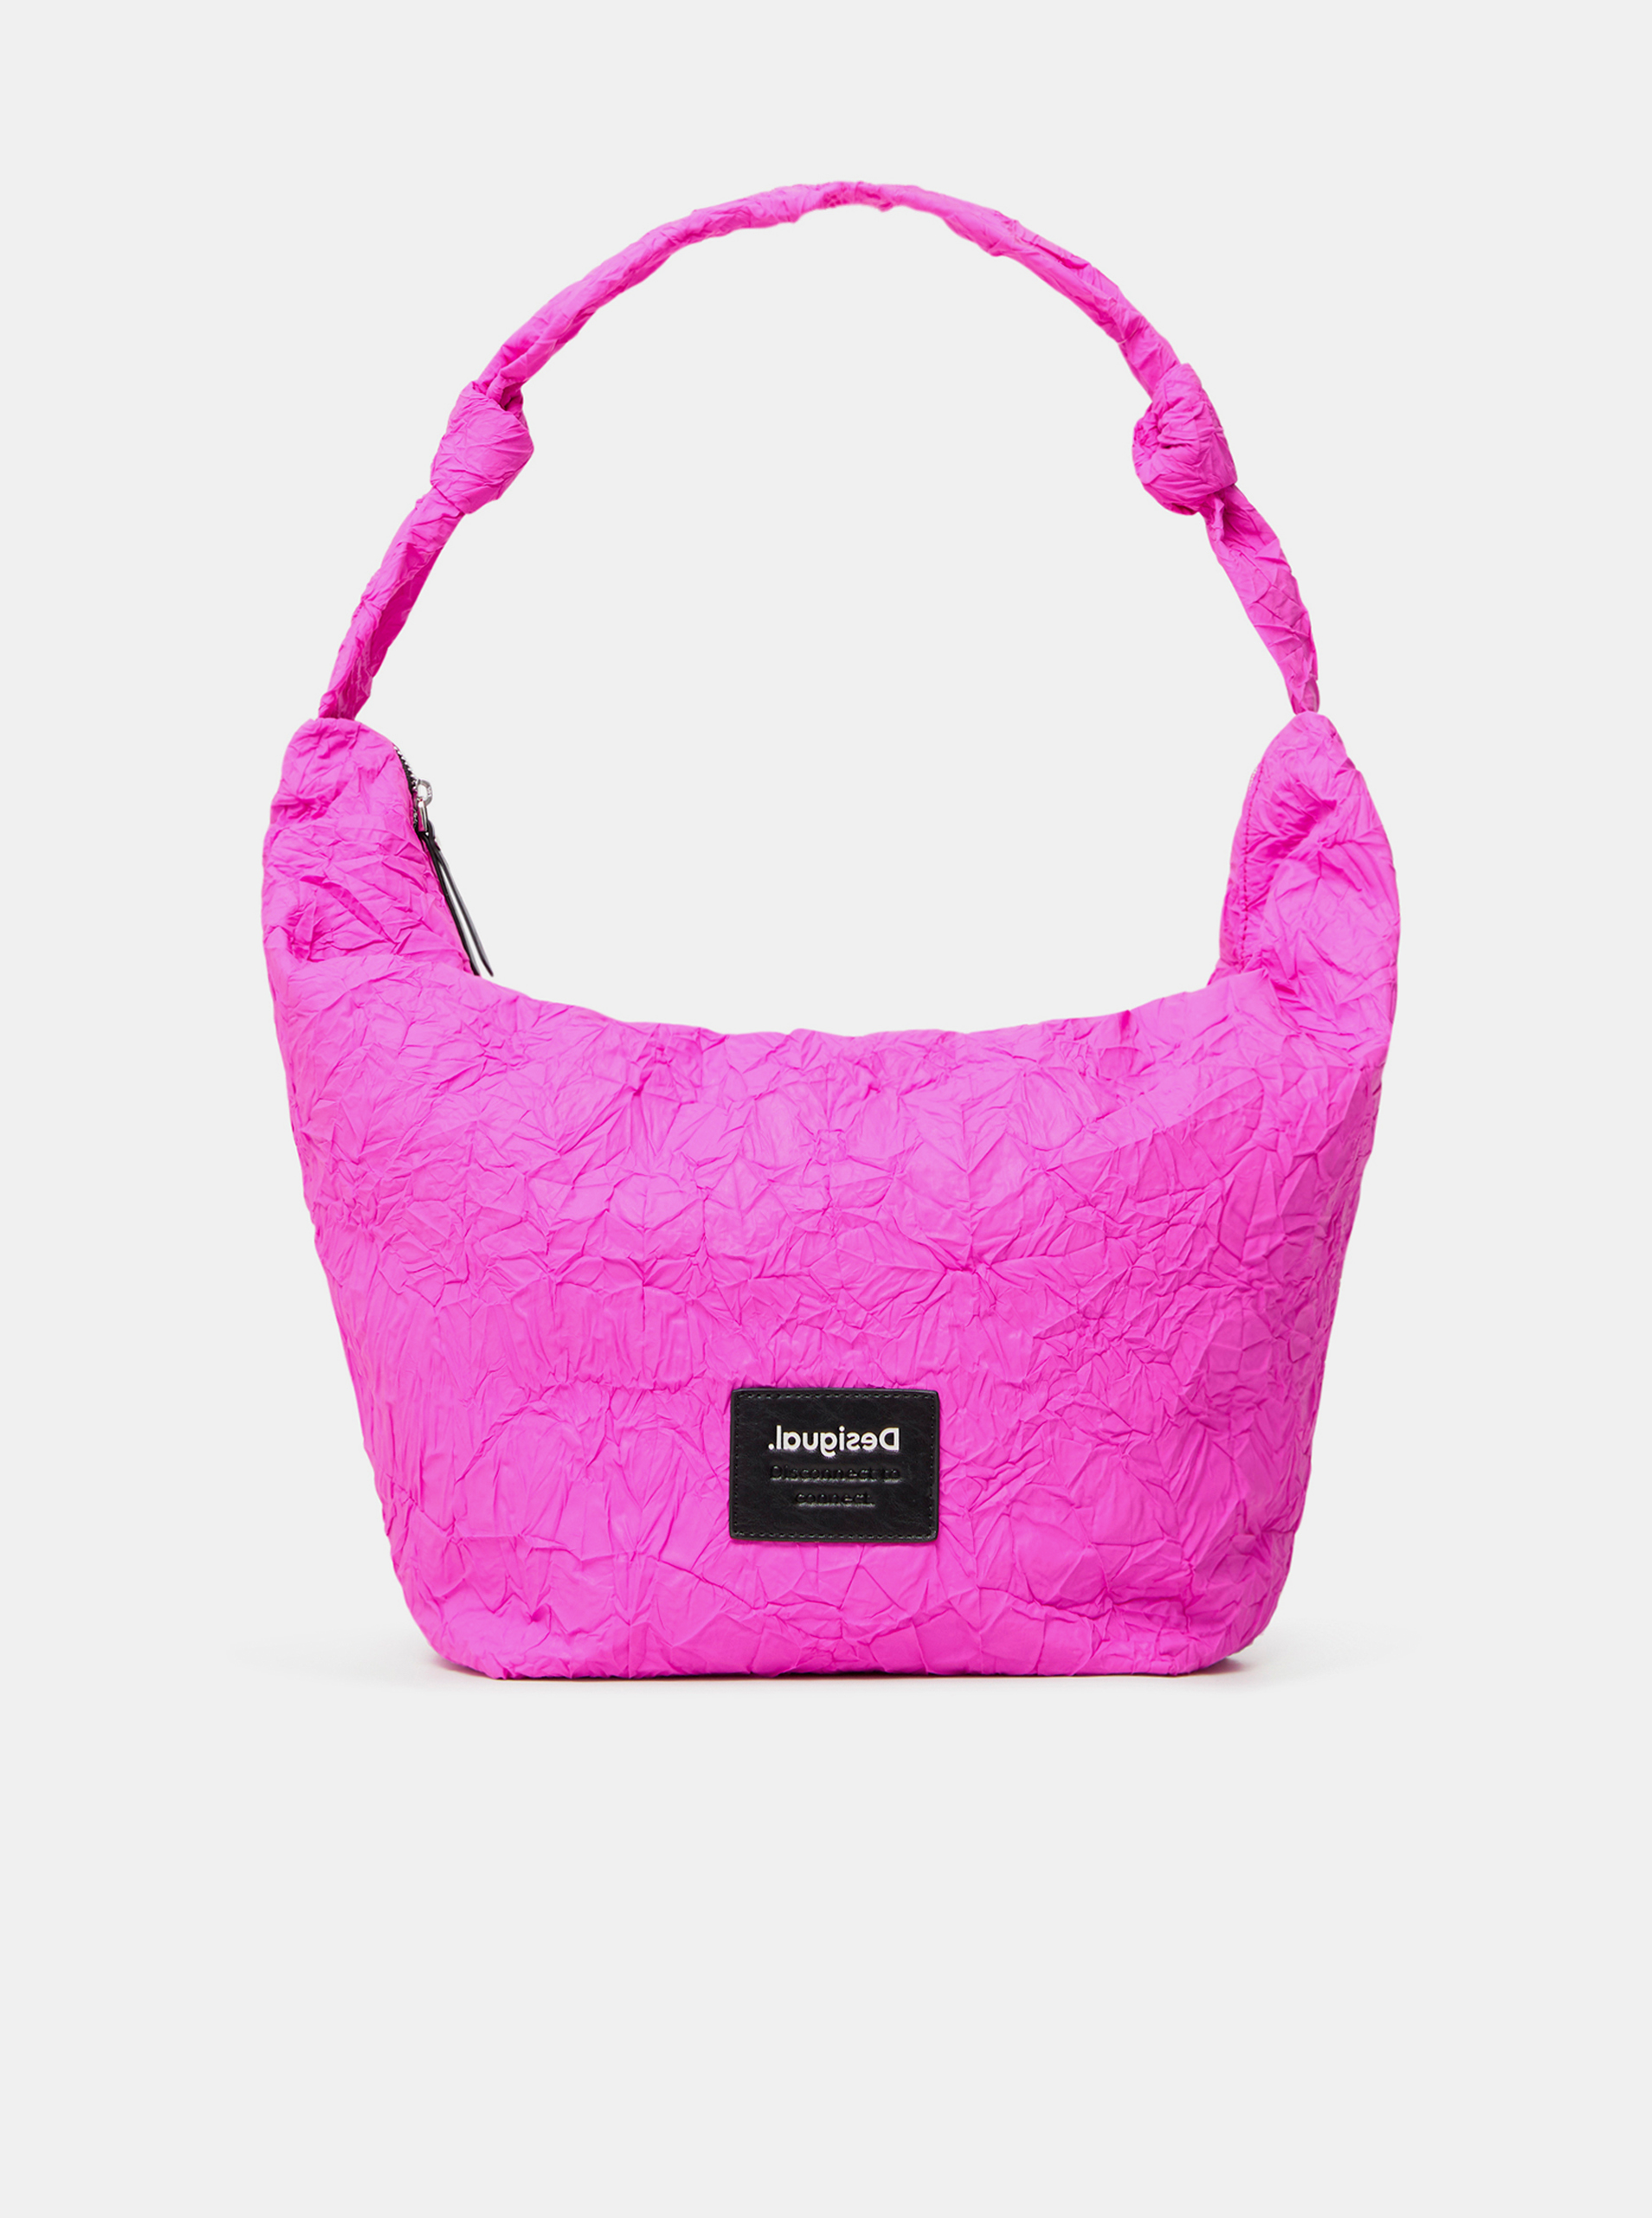 Desigual pink large handbag Crush Idaho